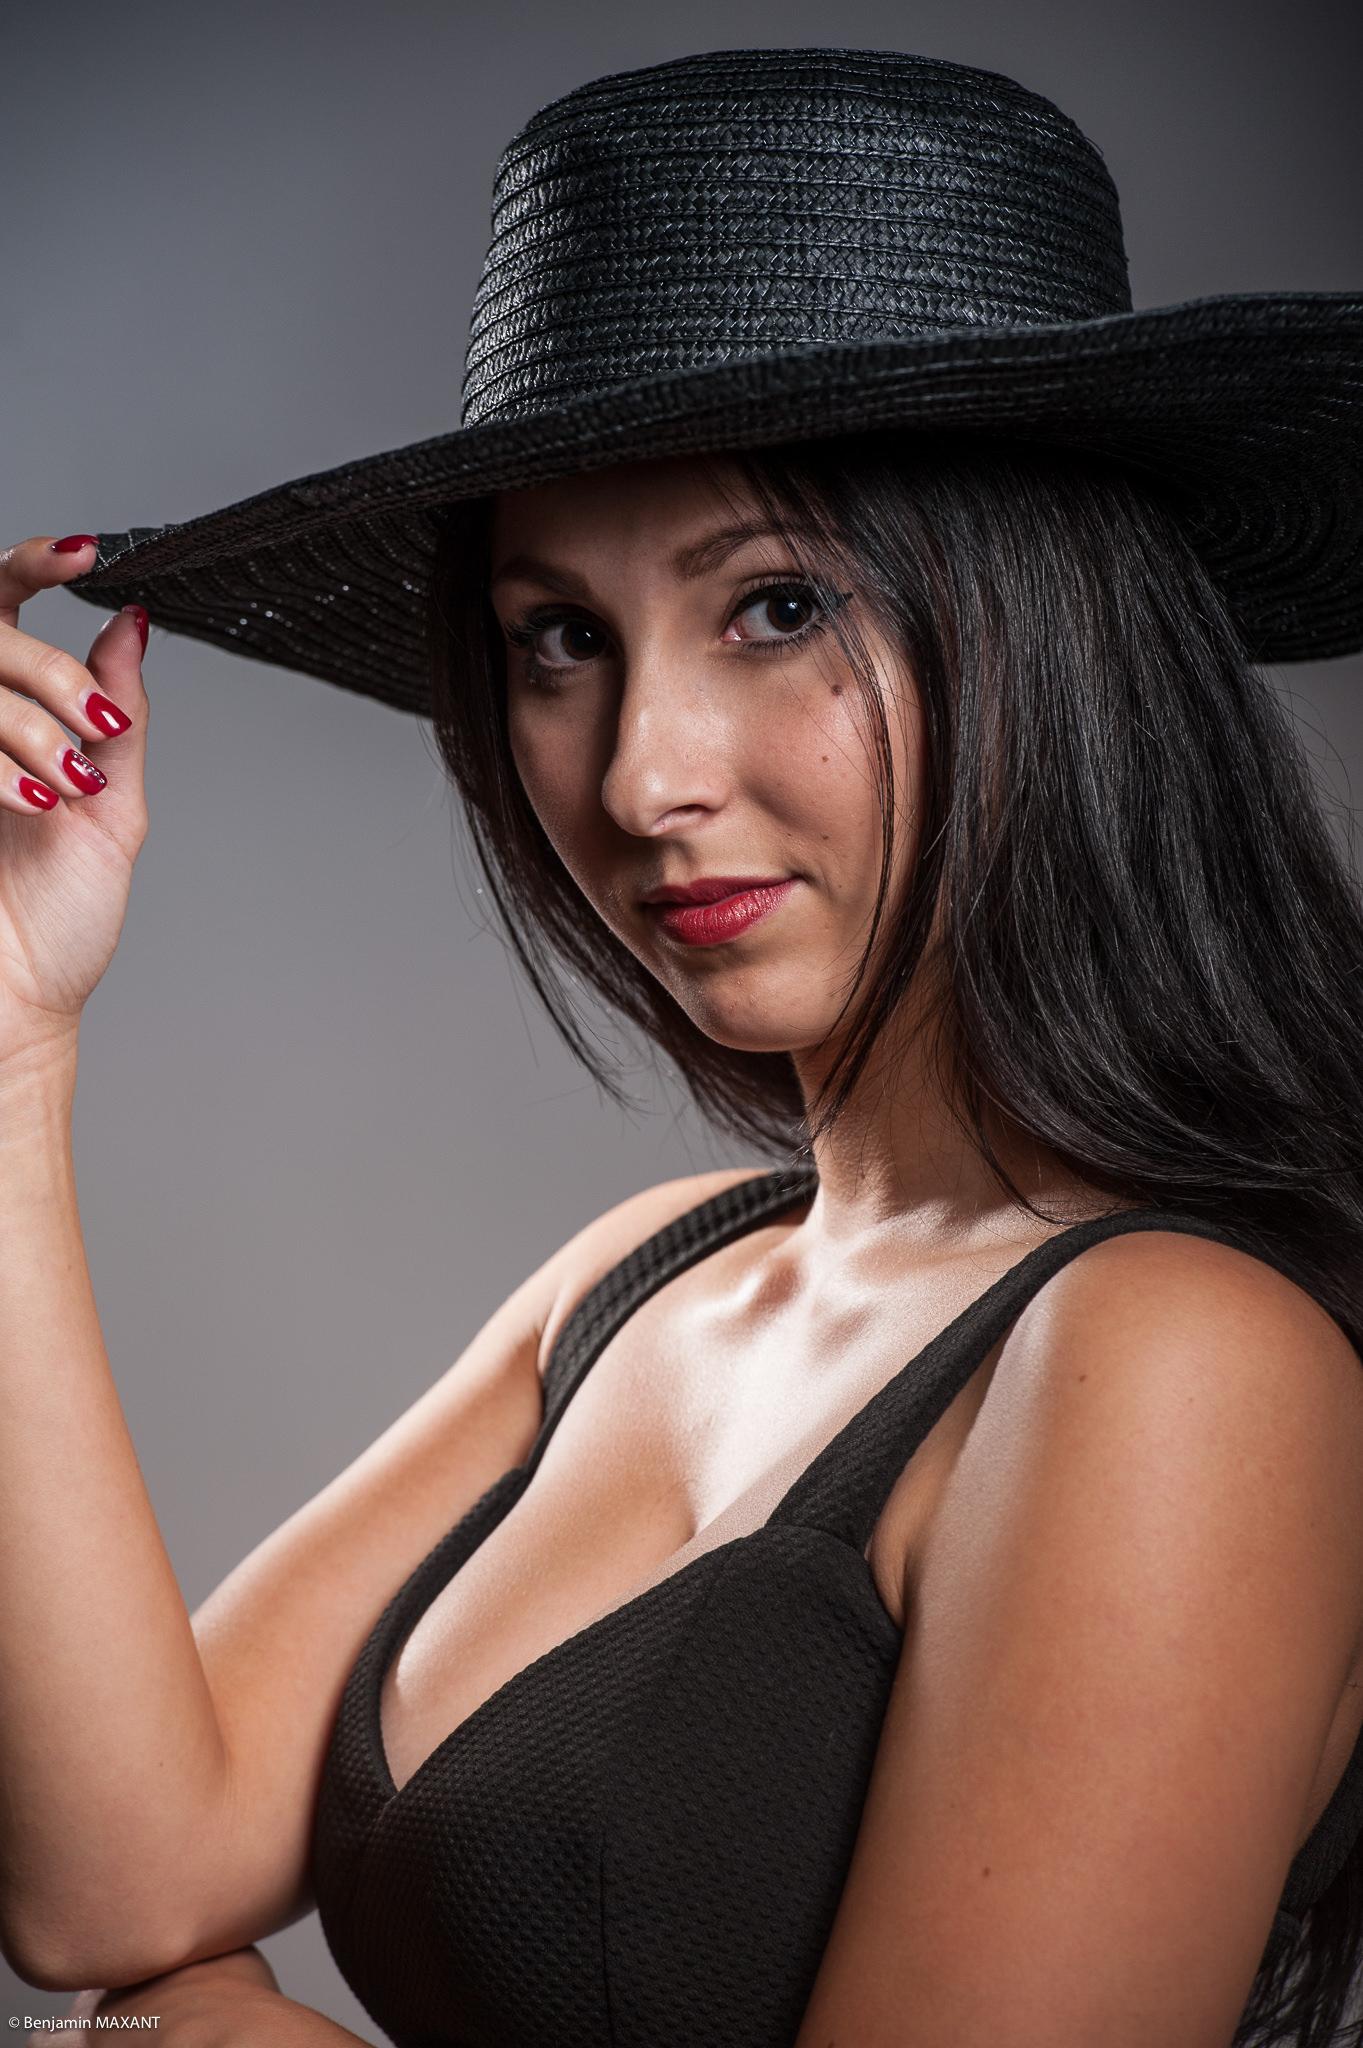 Séance photo studio glamour sexy à Nice avec Karine